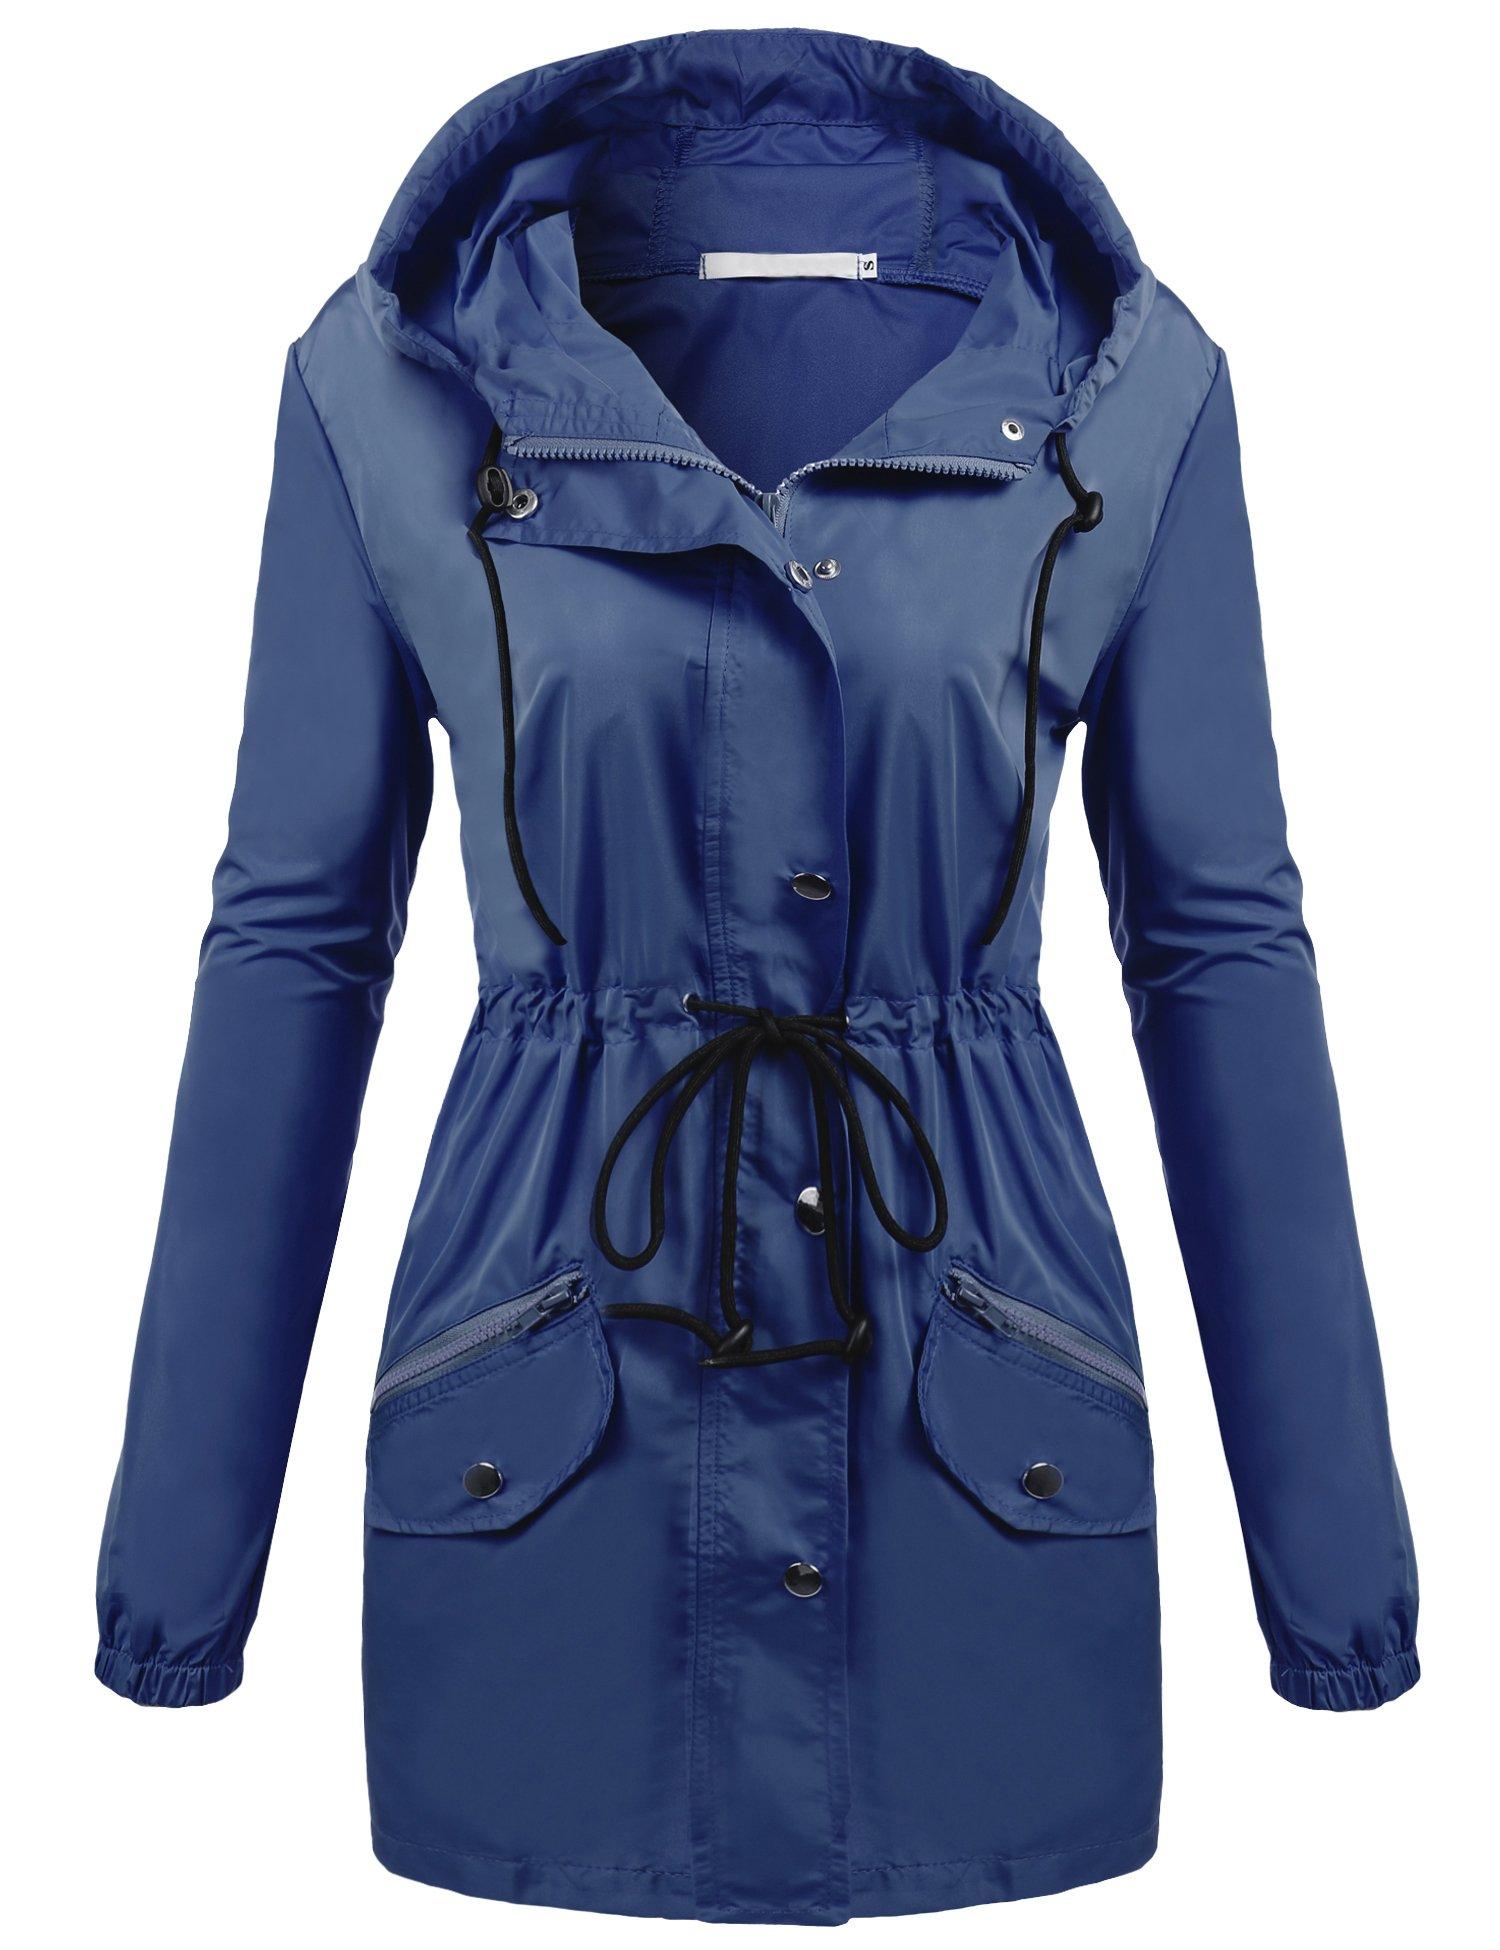 unibelle Rain Jacket Women Lightweight Hooded Waterproof Raincoat Dark Blue